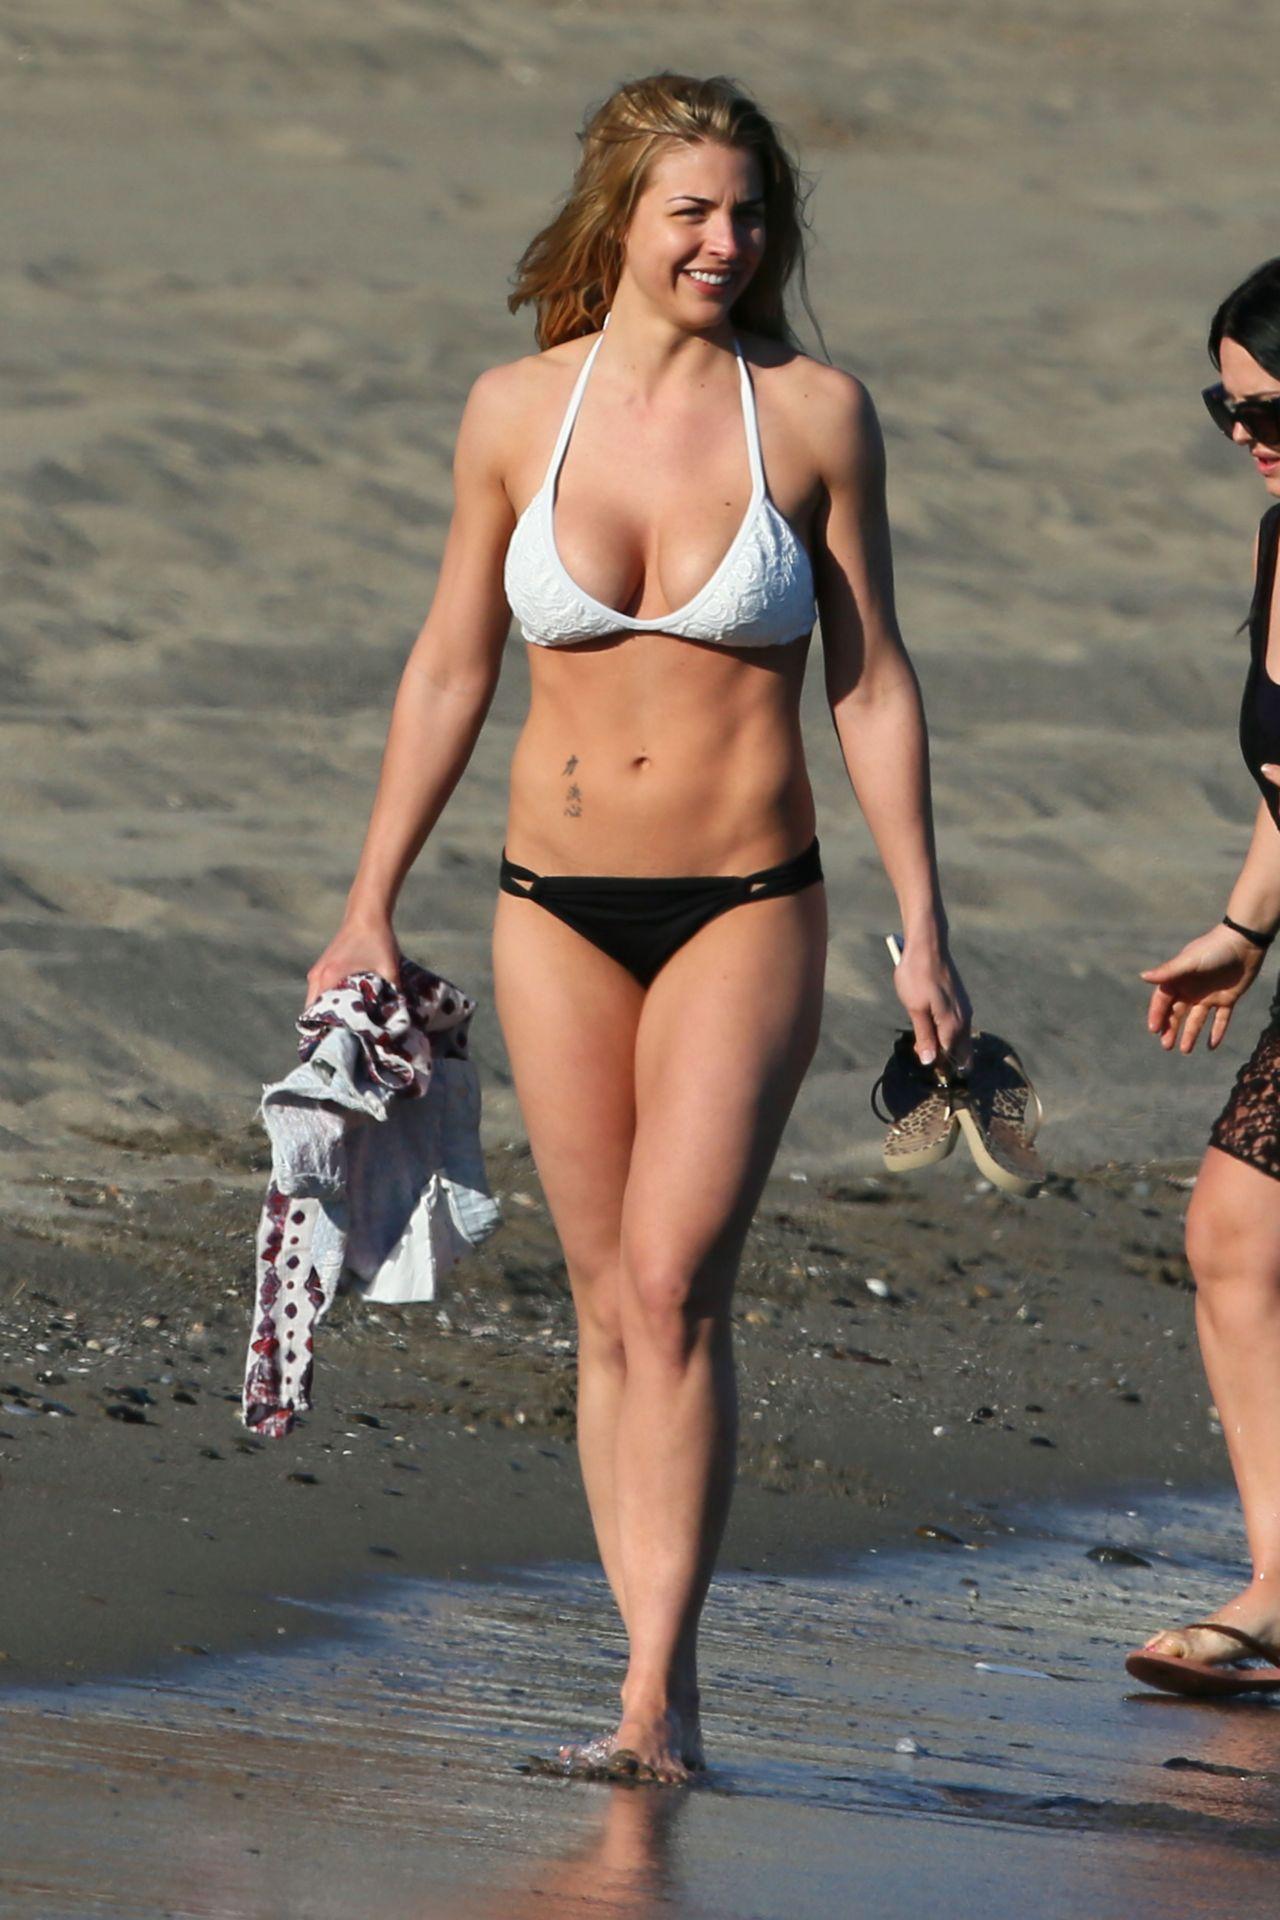 Gemma Atkinson Bikini Marbella In 8262016 JFKl1c